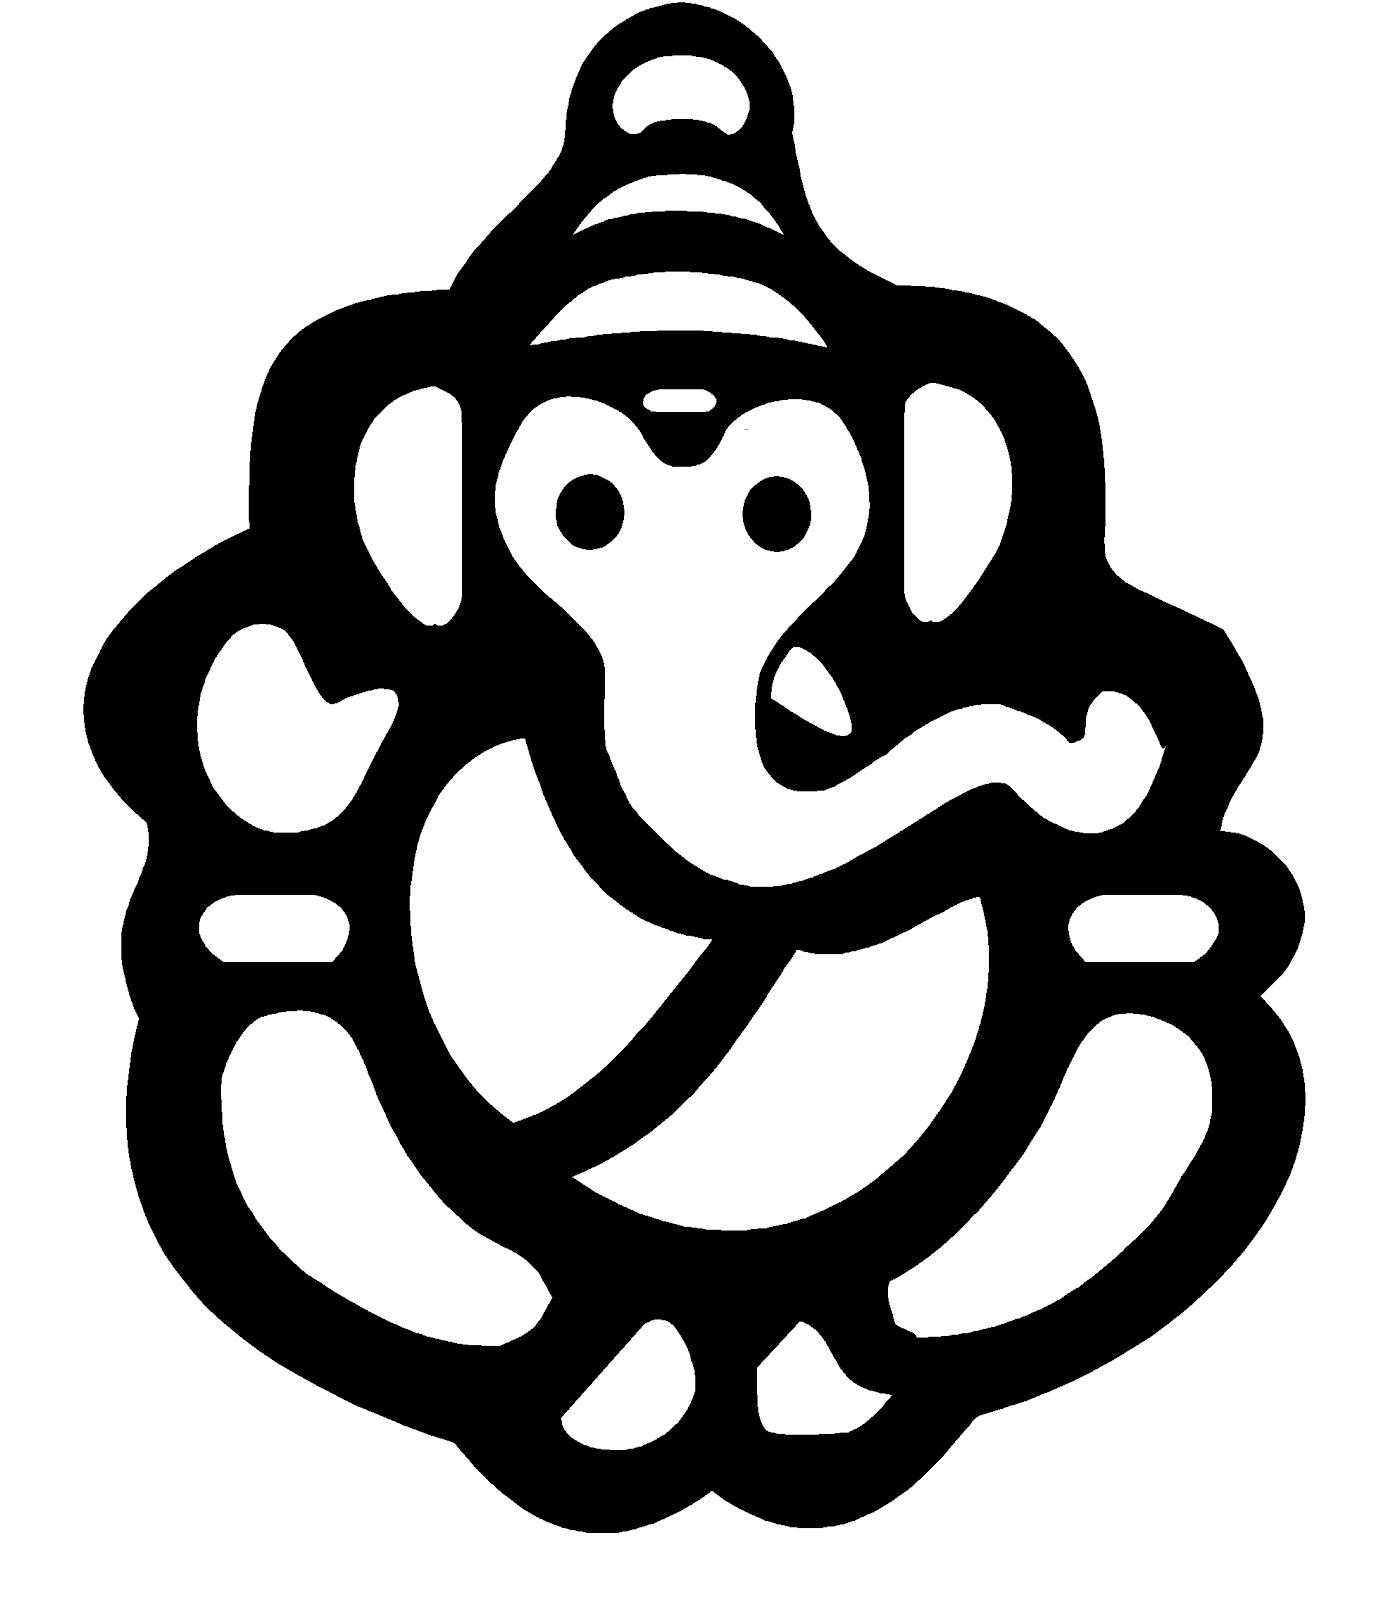 Line Art God Images : God clipart panda free images